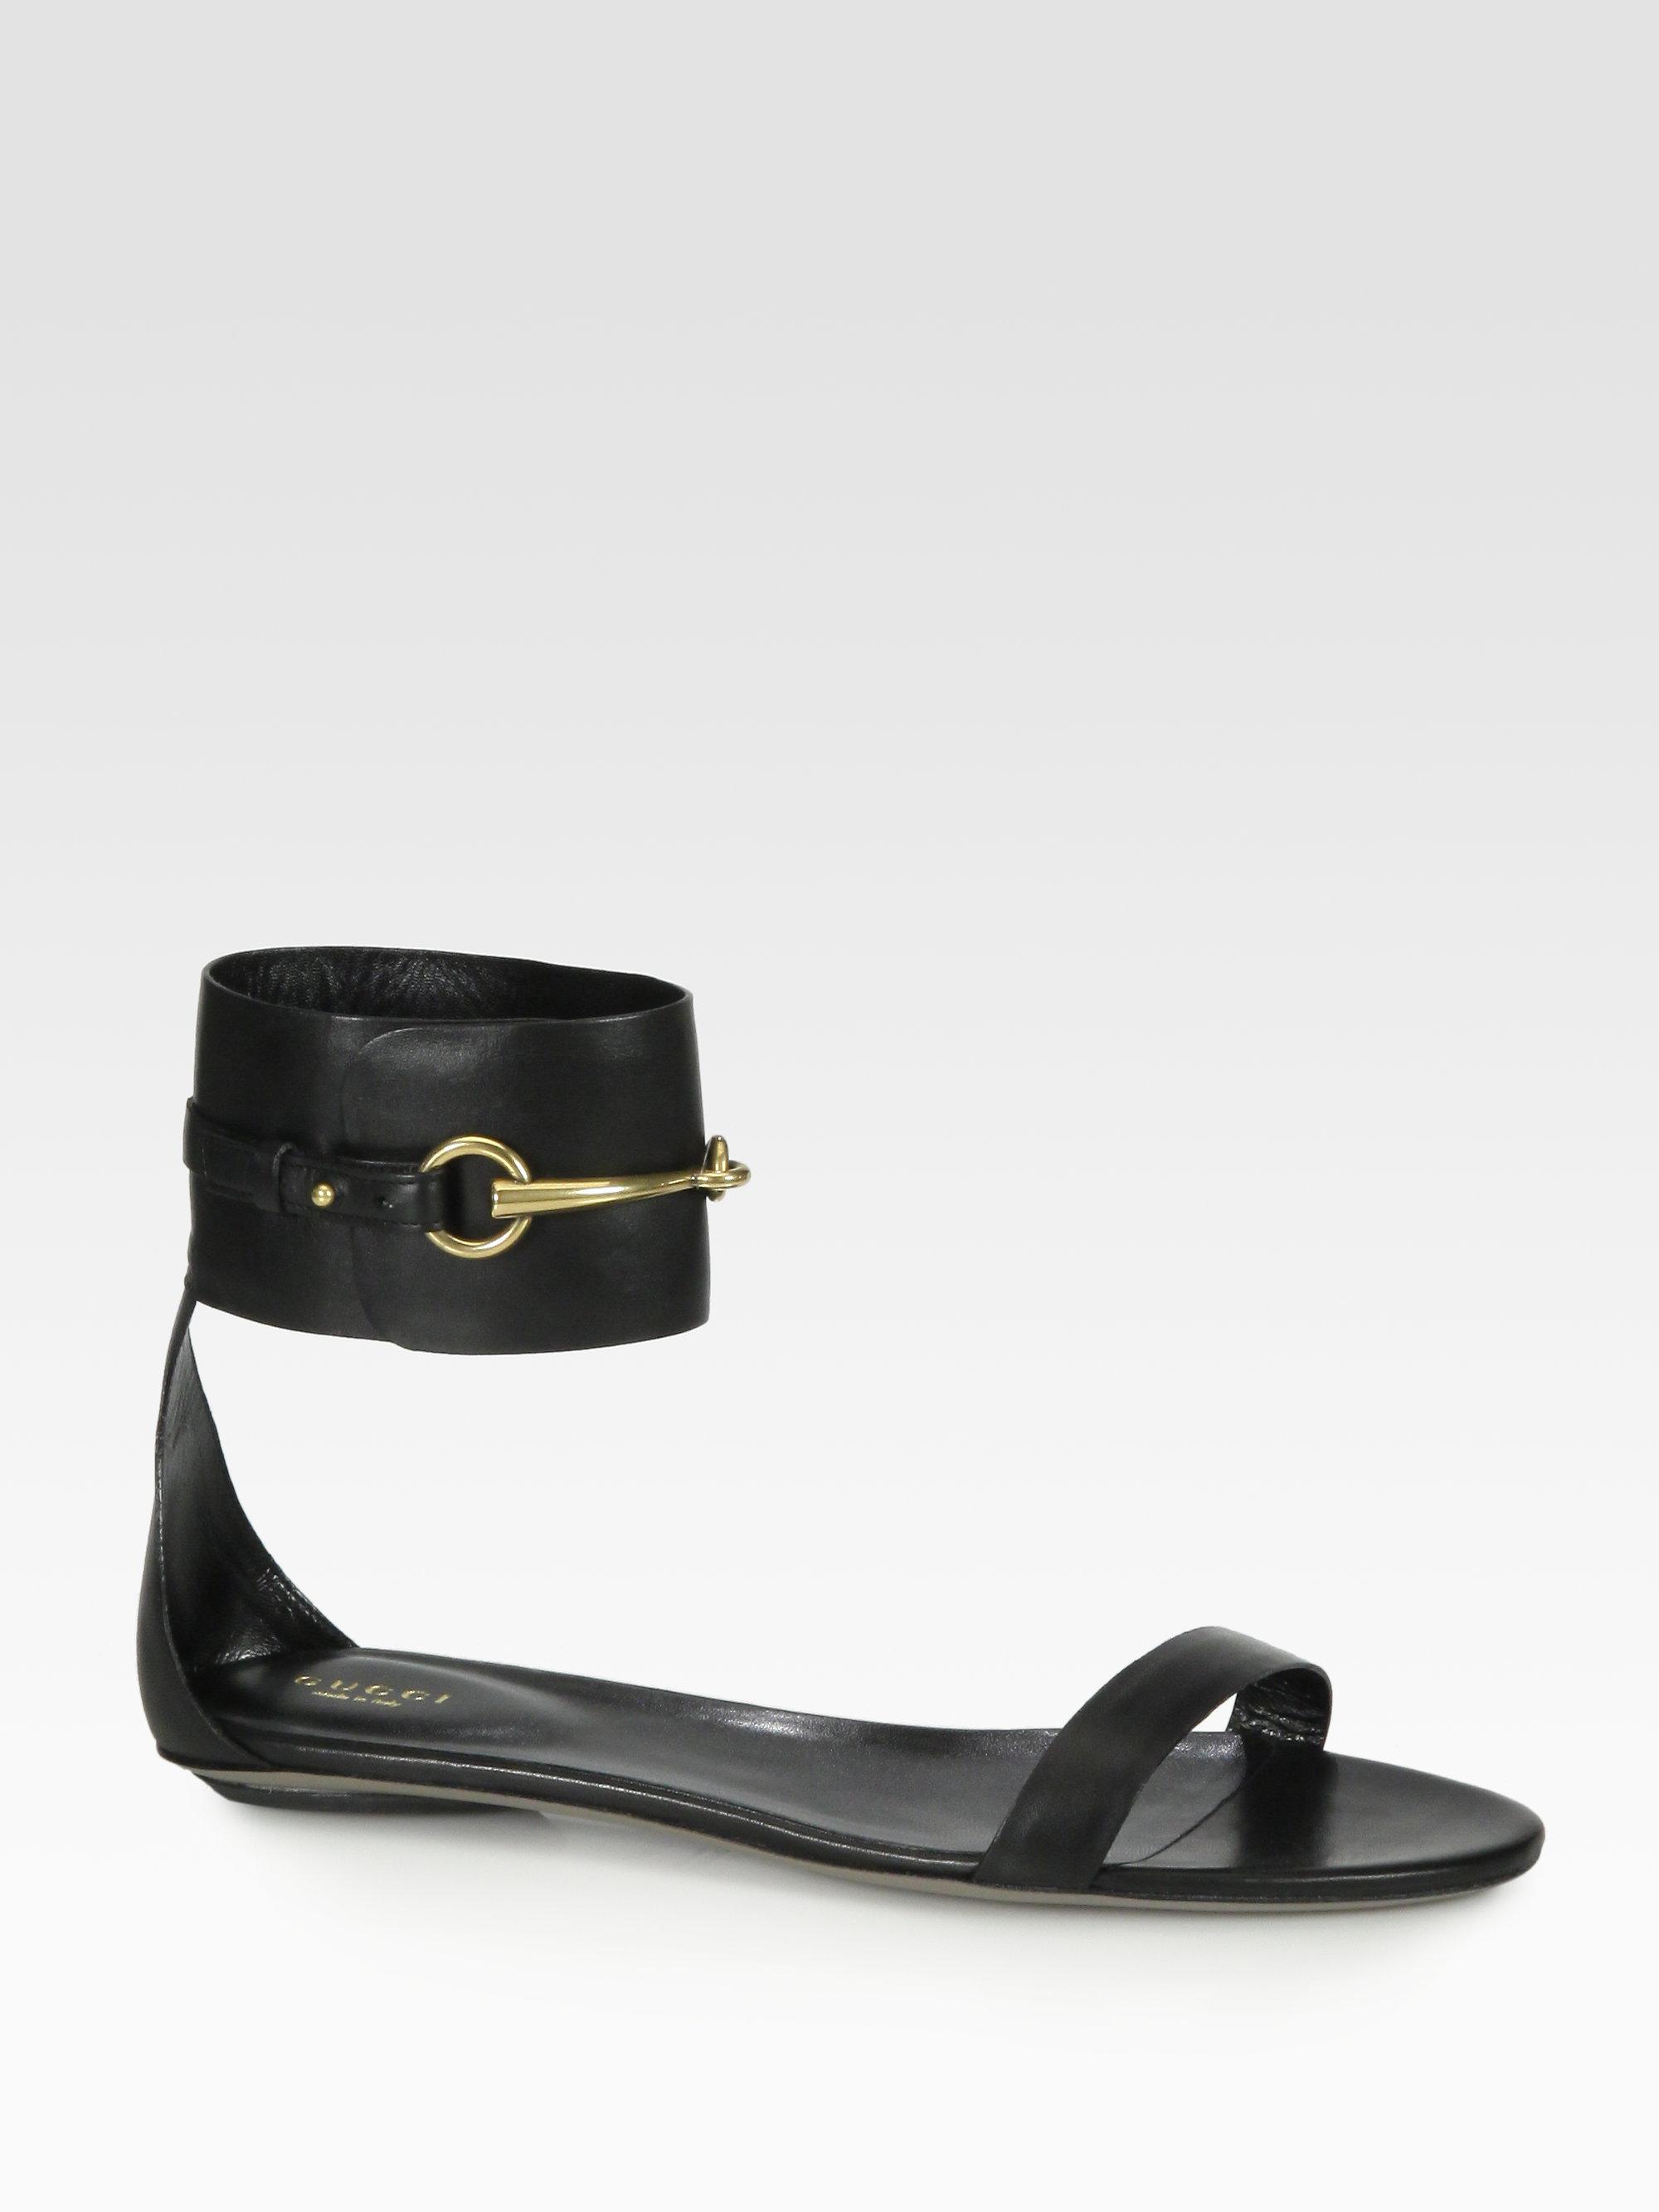 6cae803ccf15 Lyst - Gucci Ursula Leather Horsebit Ankle Strap Sandals in Black